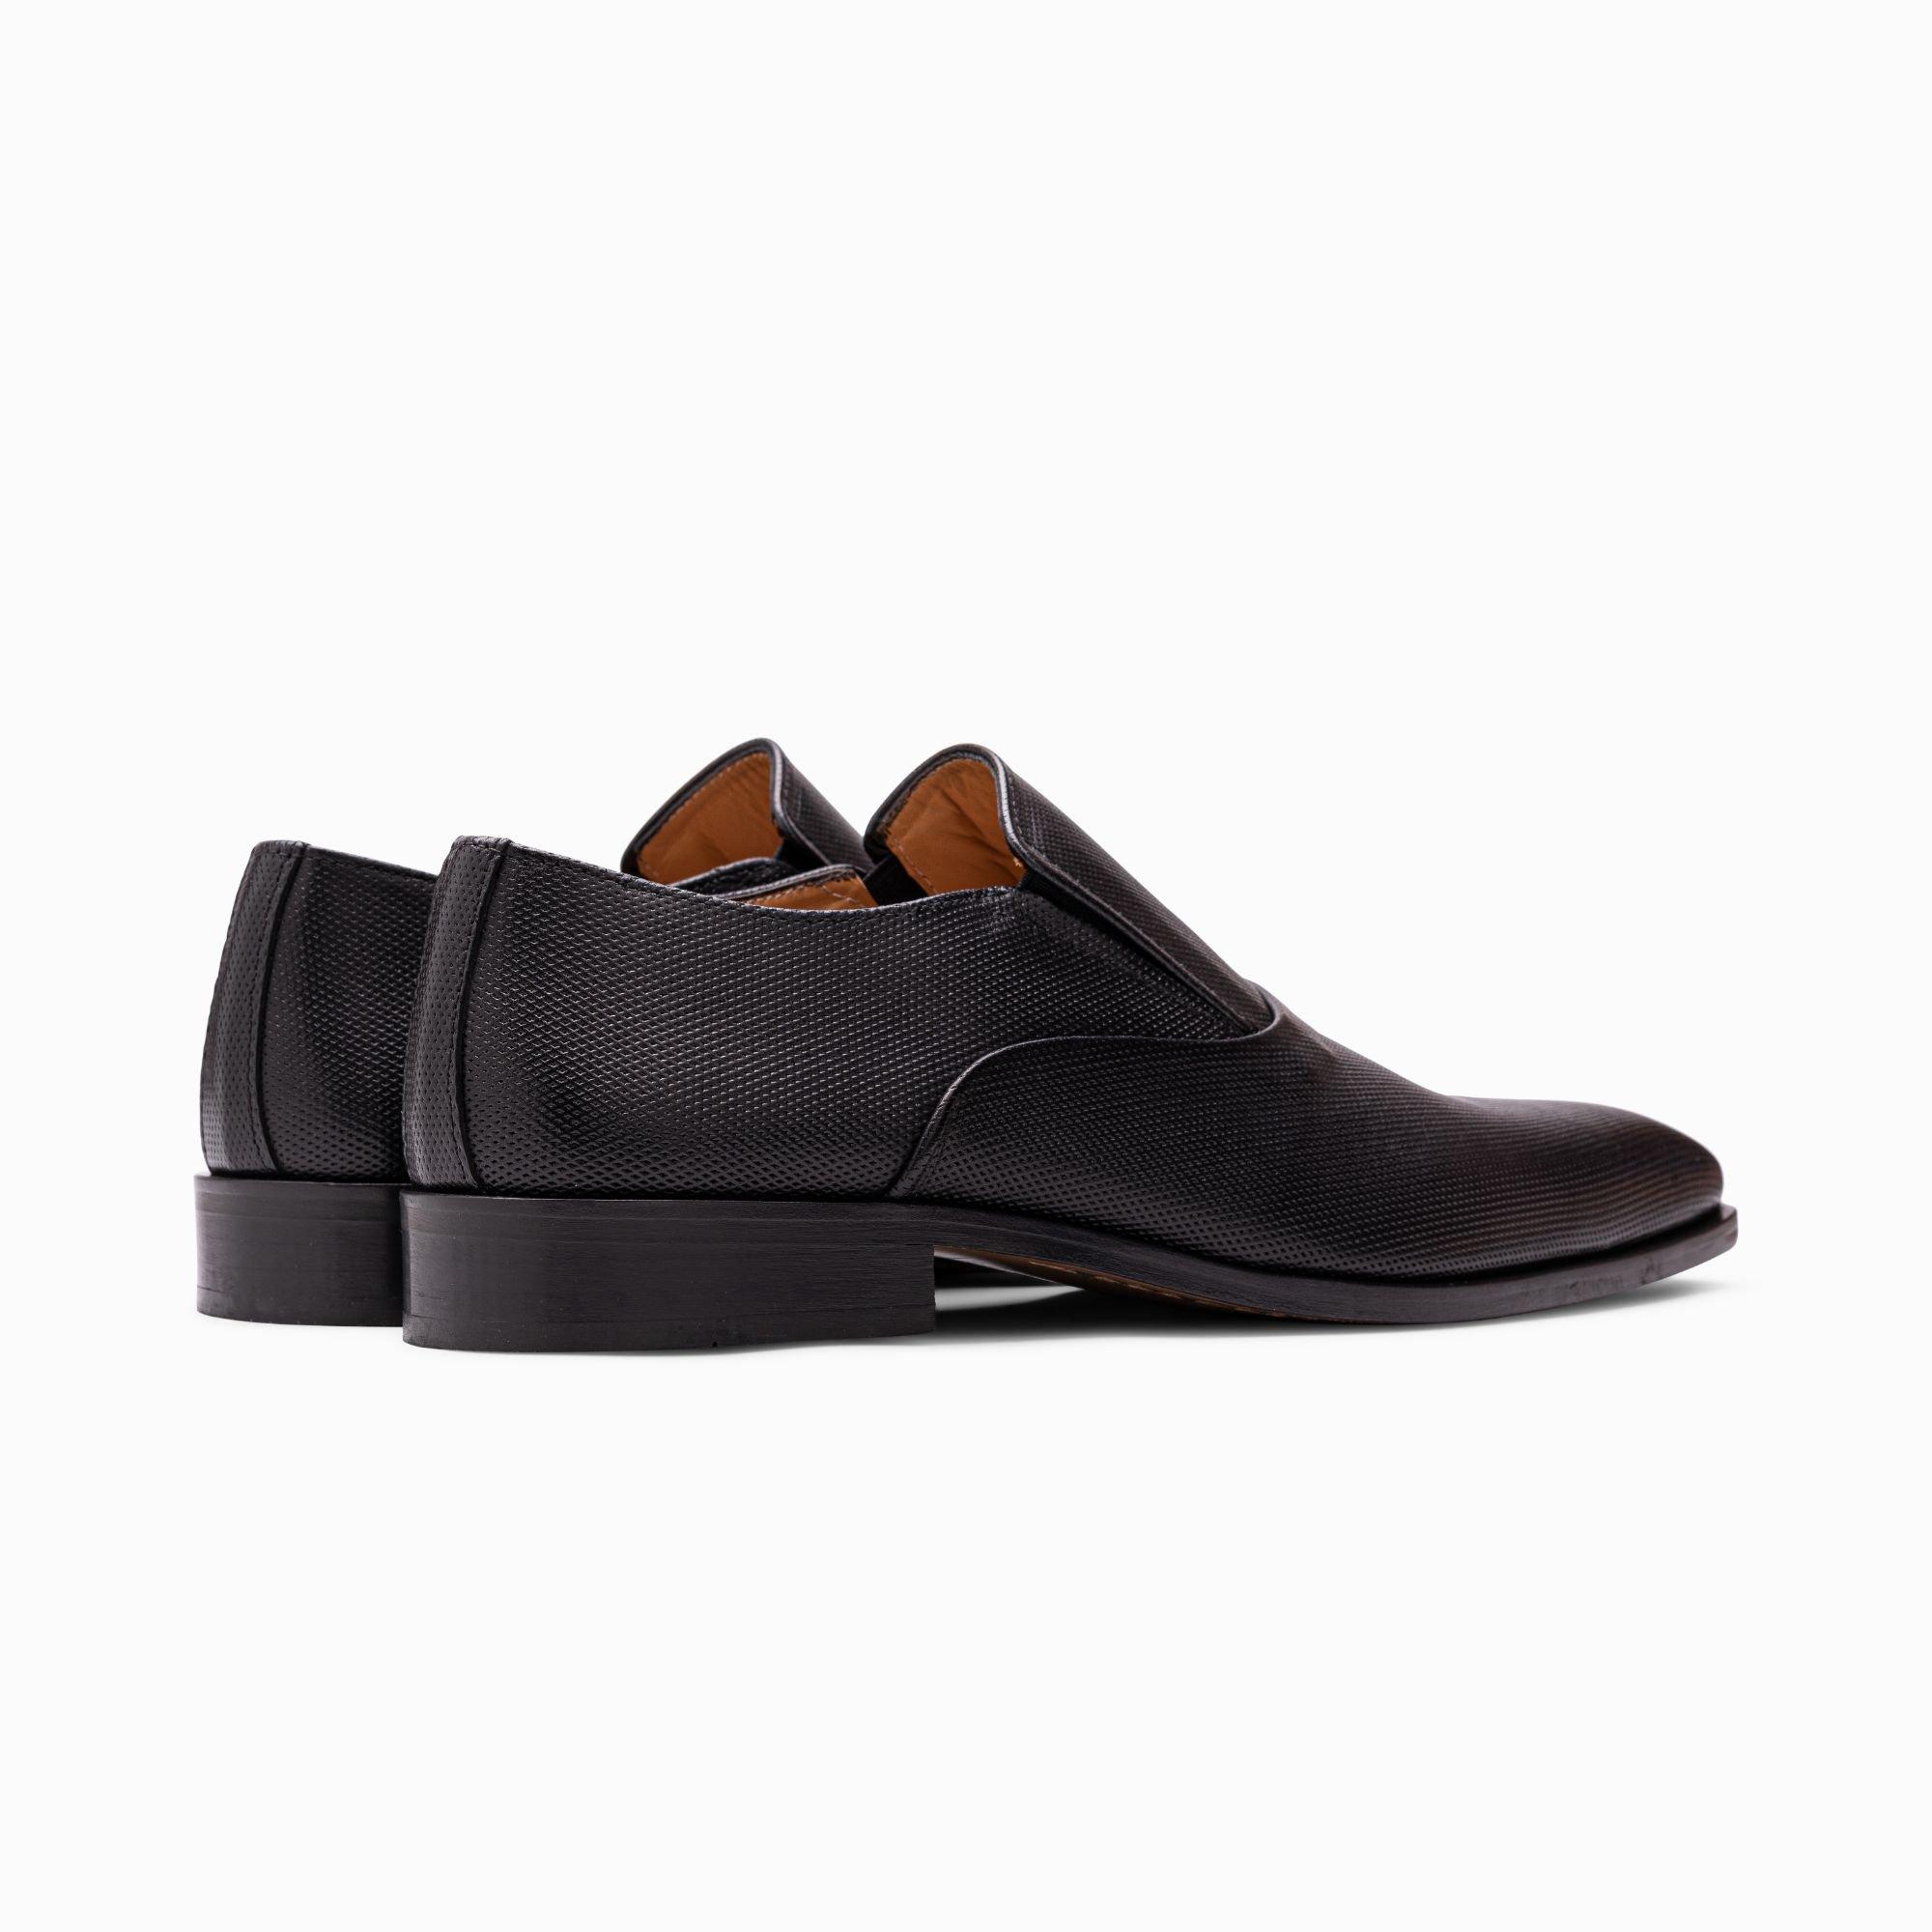 1301b-black-mat-leather_02